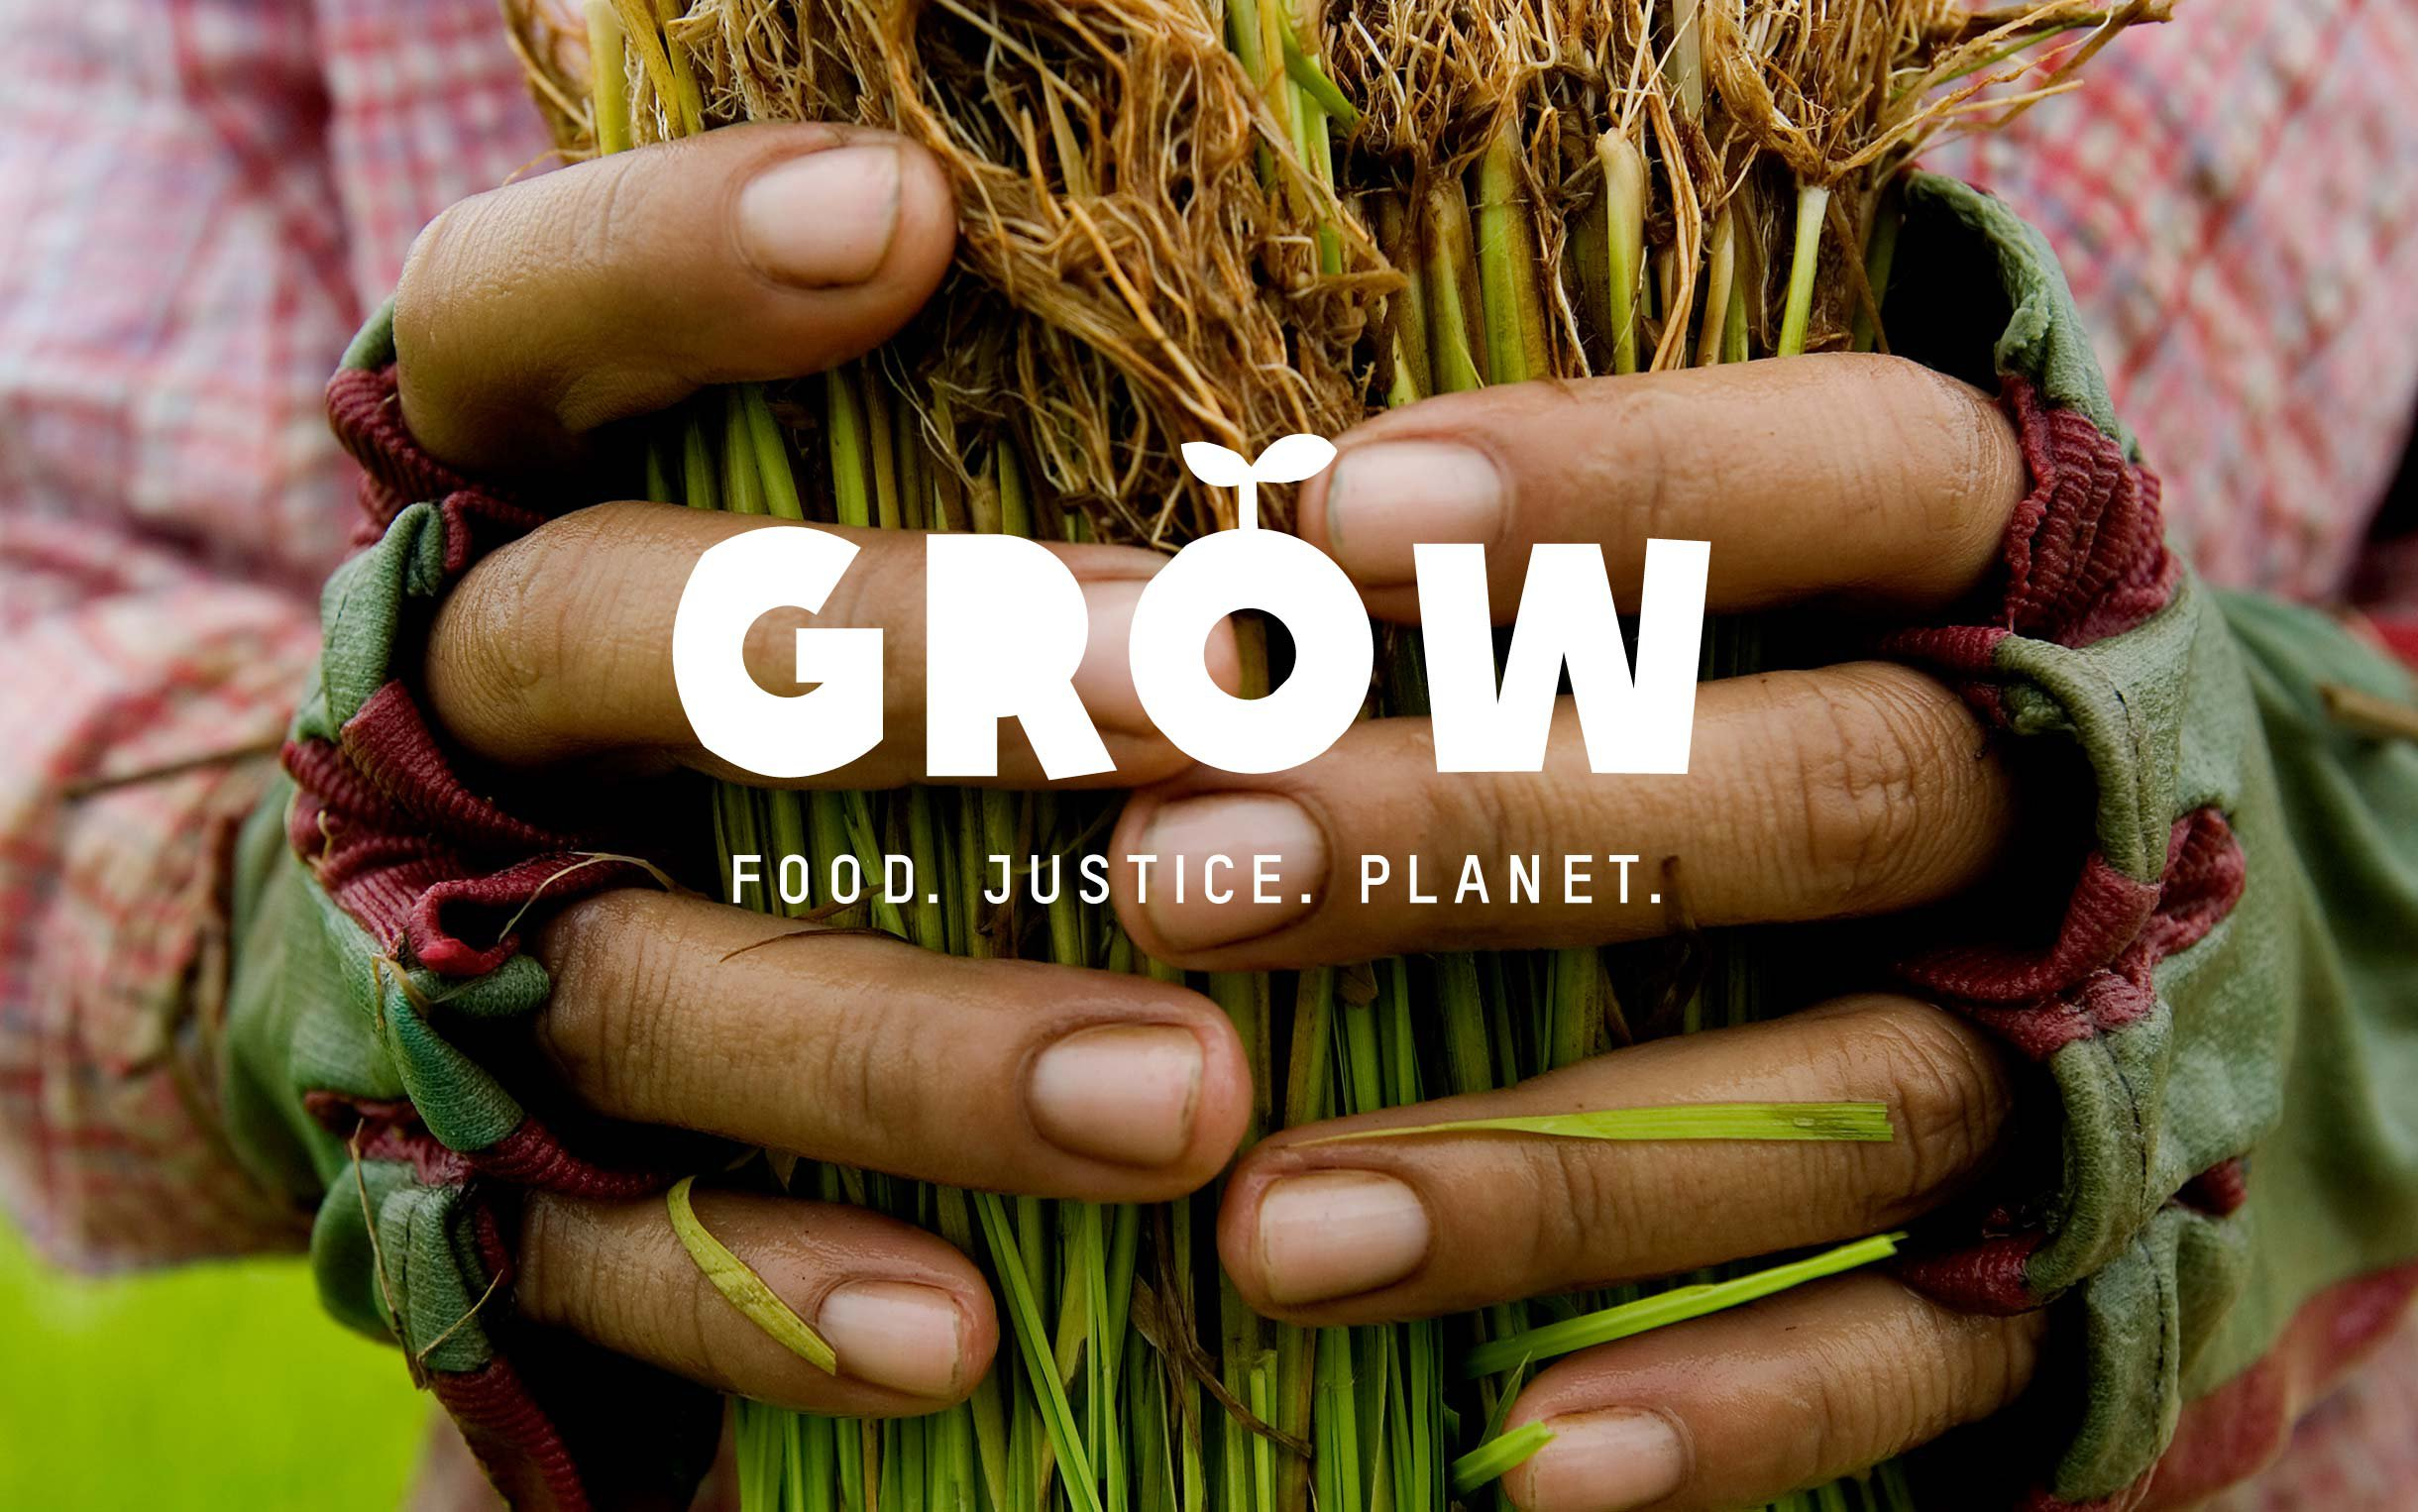 grow-campaign-rice-farmer-cambodia-ogb-46427.jpg